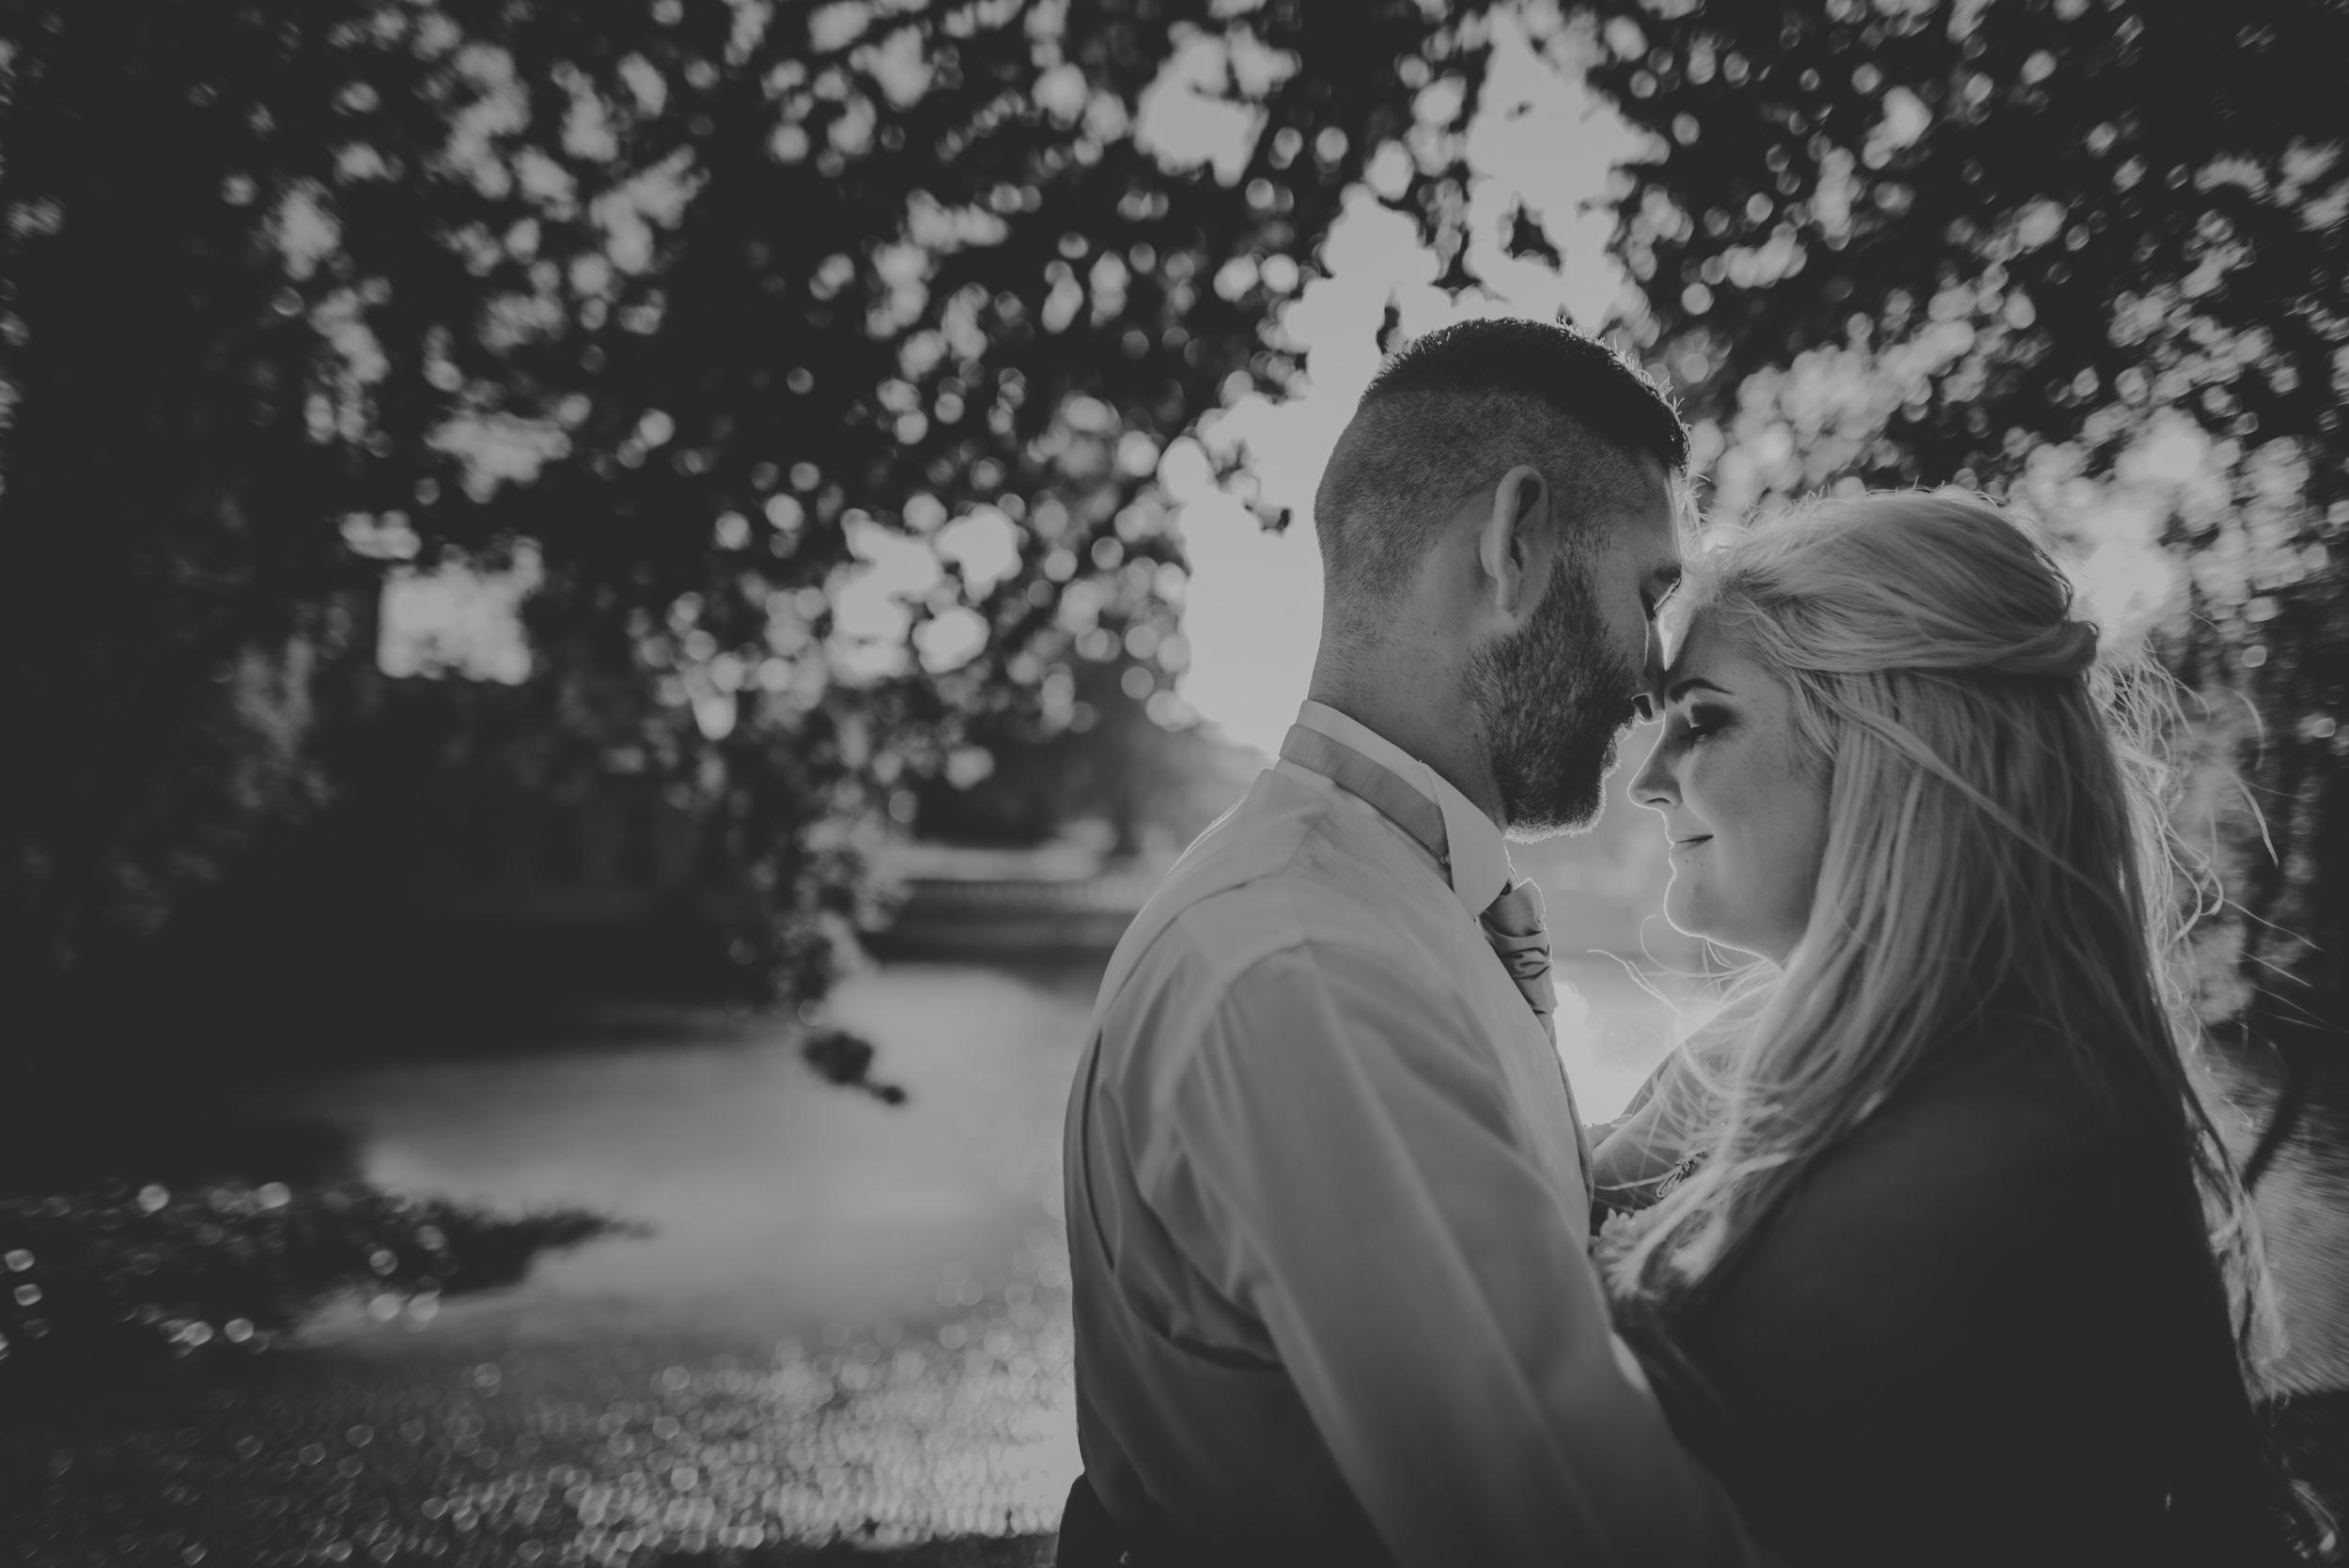 Rachel-and-James-Wedding-Horsley-Towers-State-Manu-Mendoza-Wedding-Photography-491.jpg